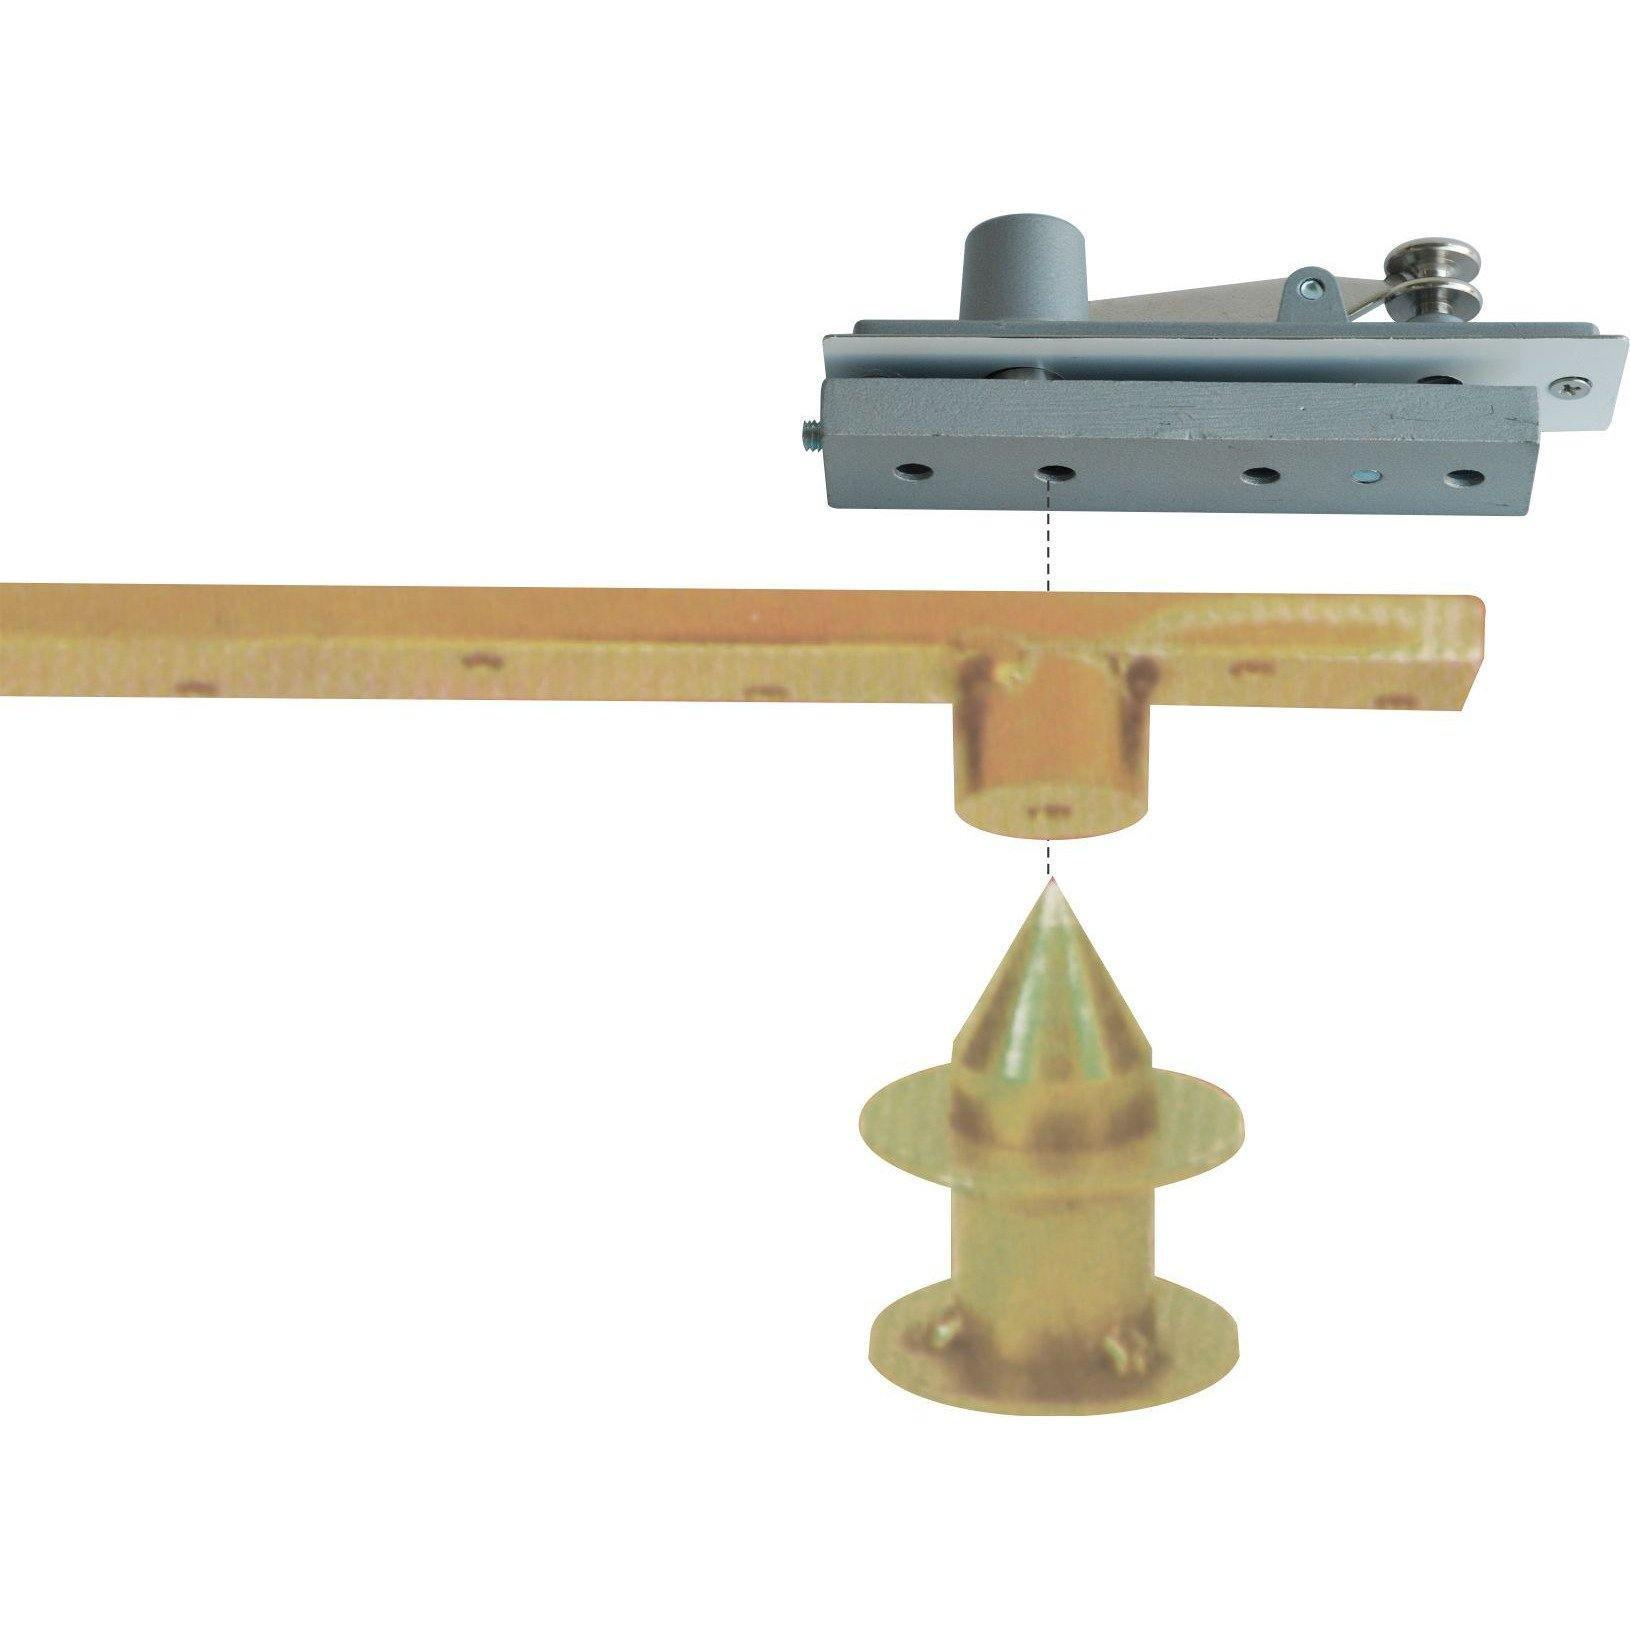 Pivot hinge - cone shaped